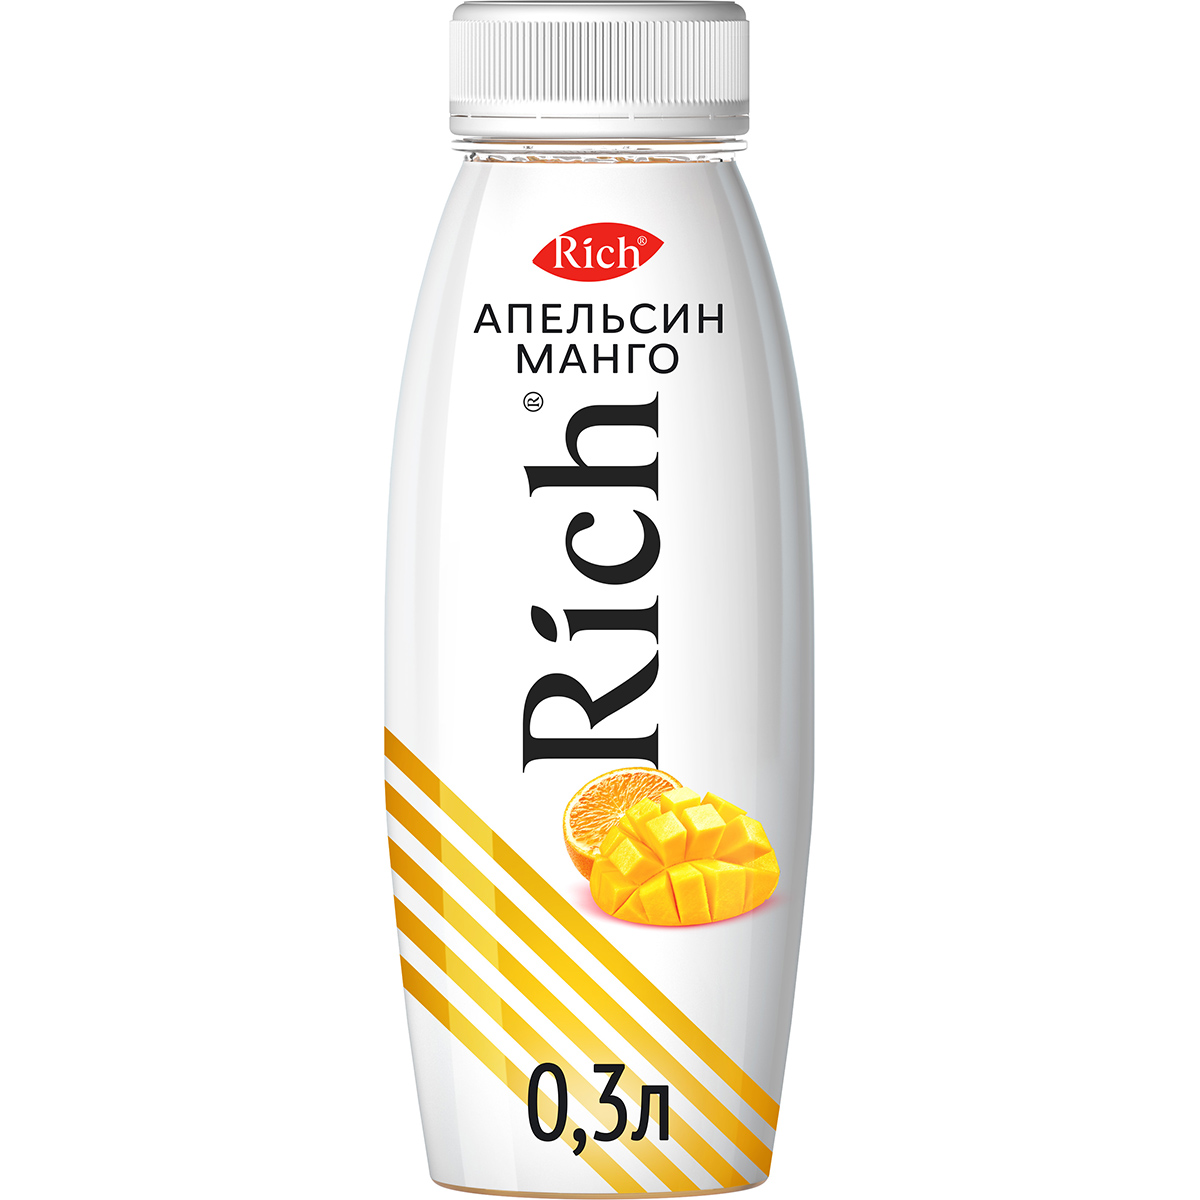 Нектар Rich апельсин-манго 0,3л нектар rich апельсин манго 1 л